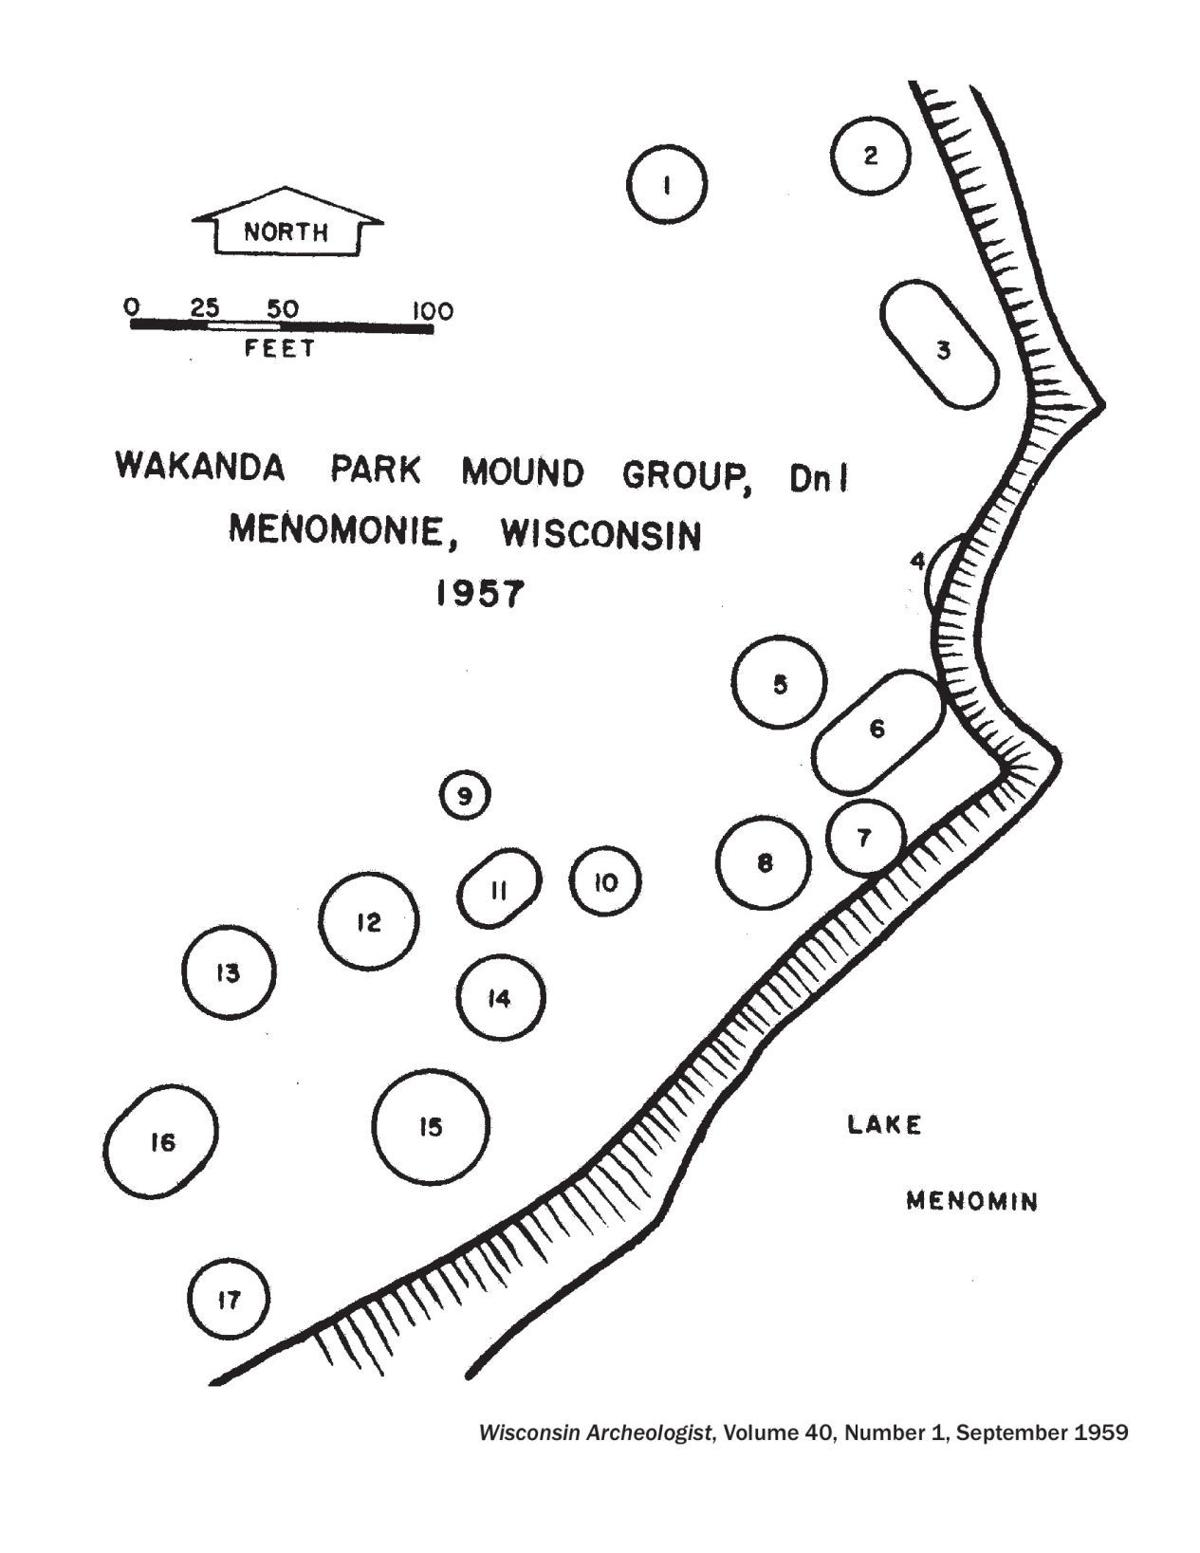 Wakanda Park Mound Group 1957 map